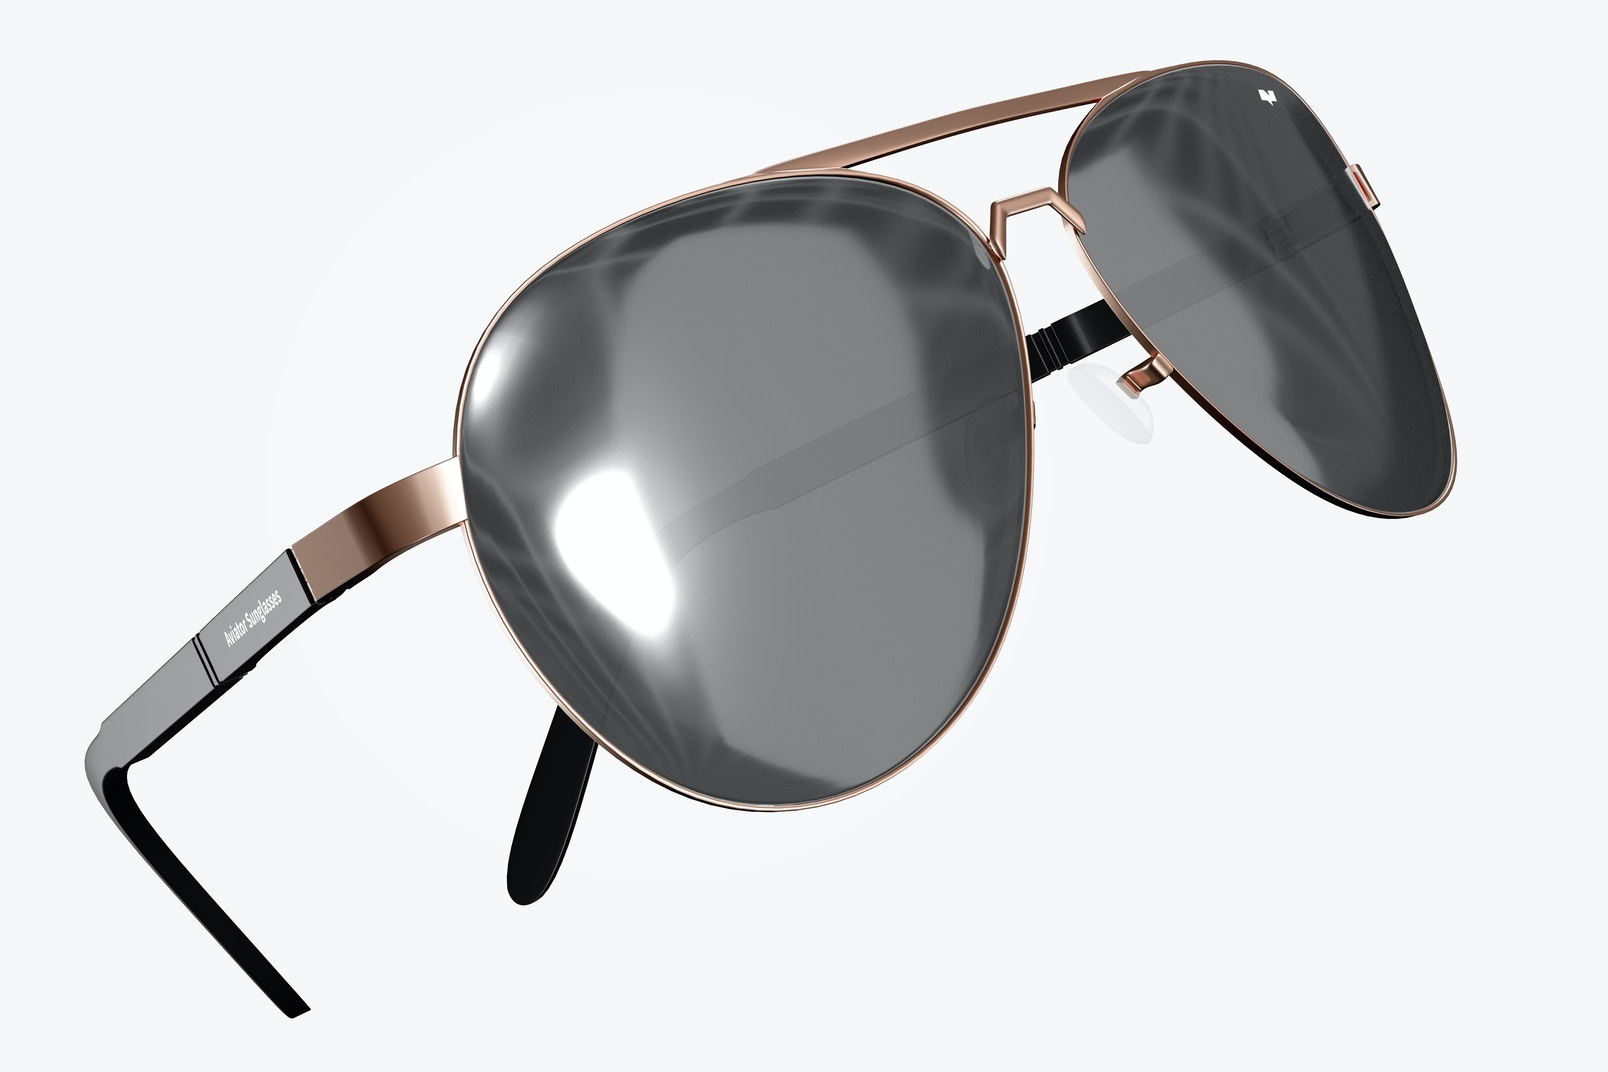 Aviator Sunglasses Mockup, Floating